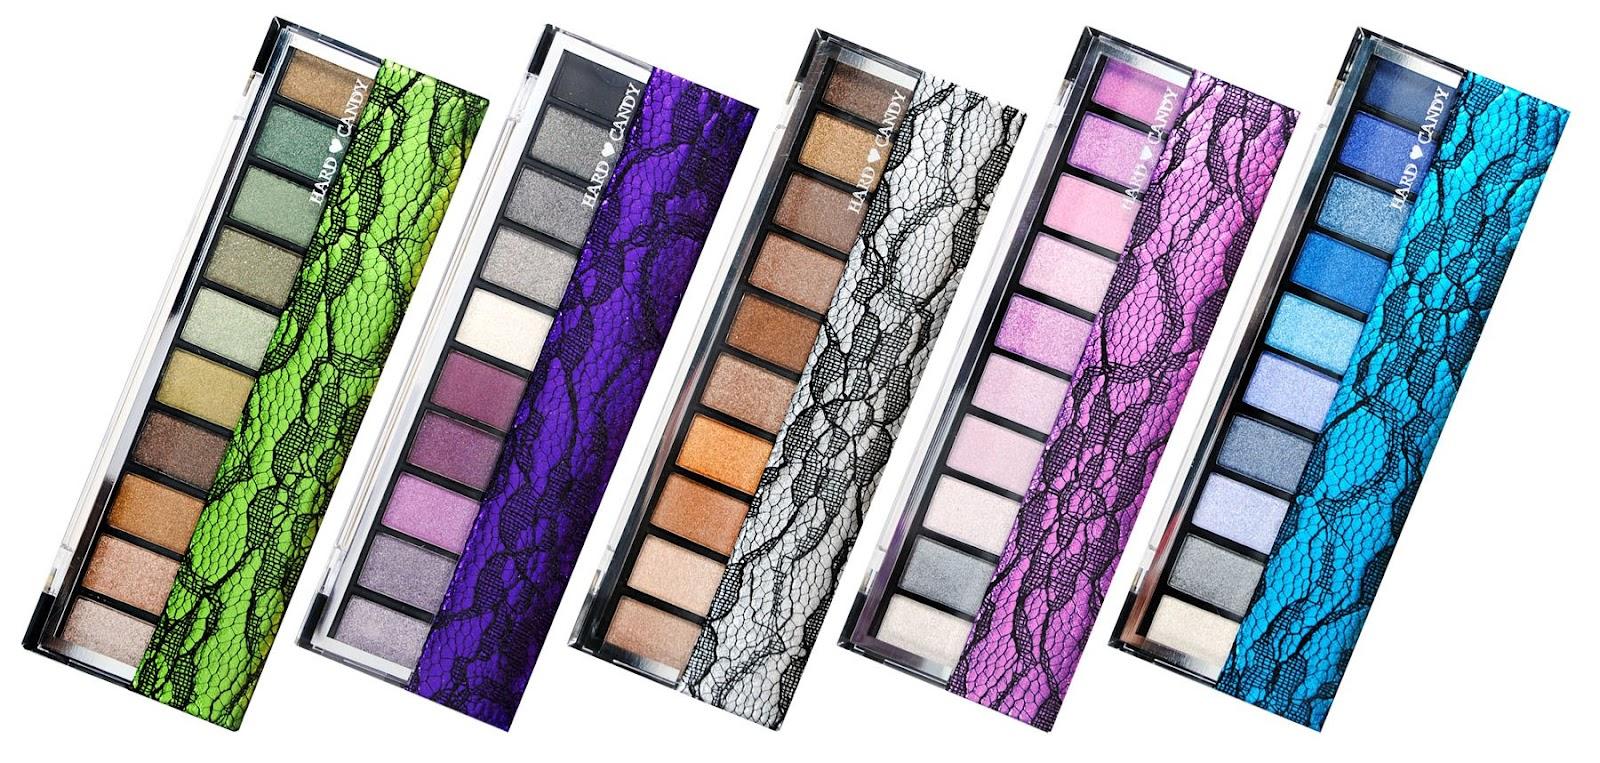 News from Hard Candy cosmetics *Loevens makeup rambles* - Hard Candy Makeup